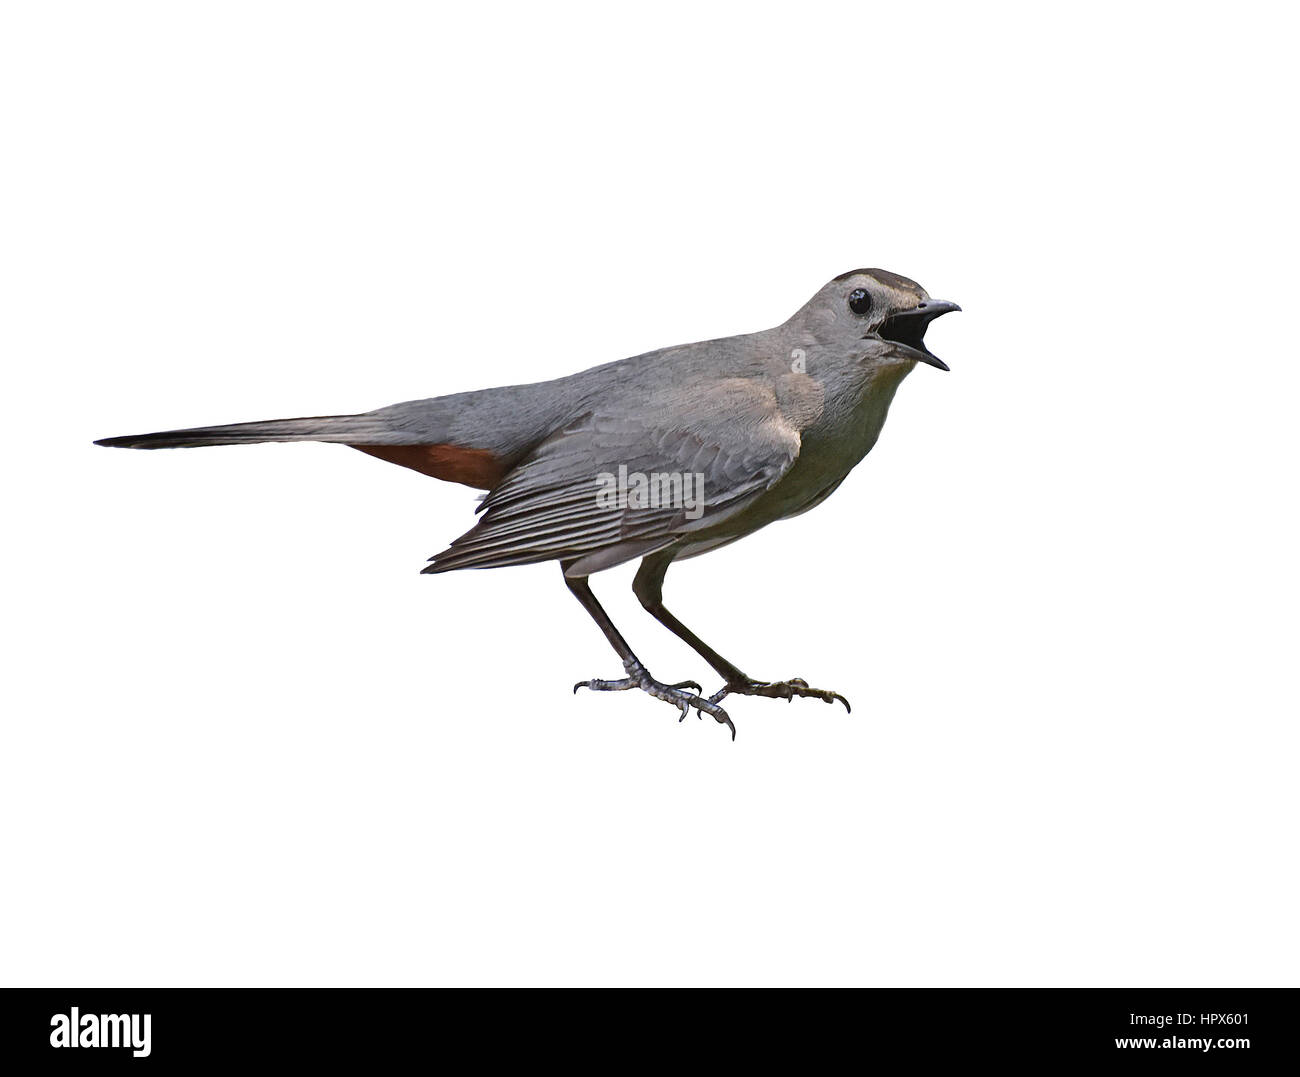 Grey Catbird (Dumetella carolinensis) in aggresive pose isolated on white background. - Stock Image